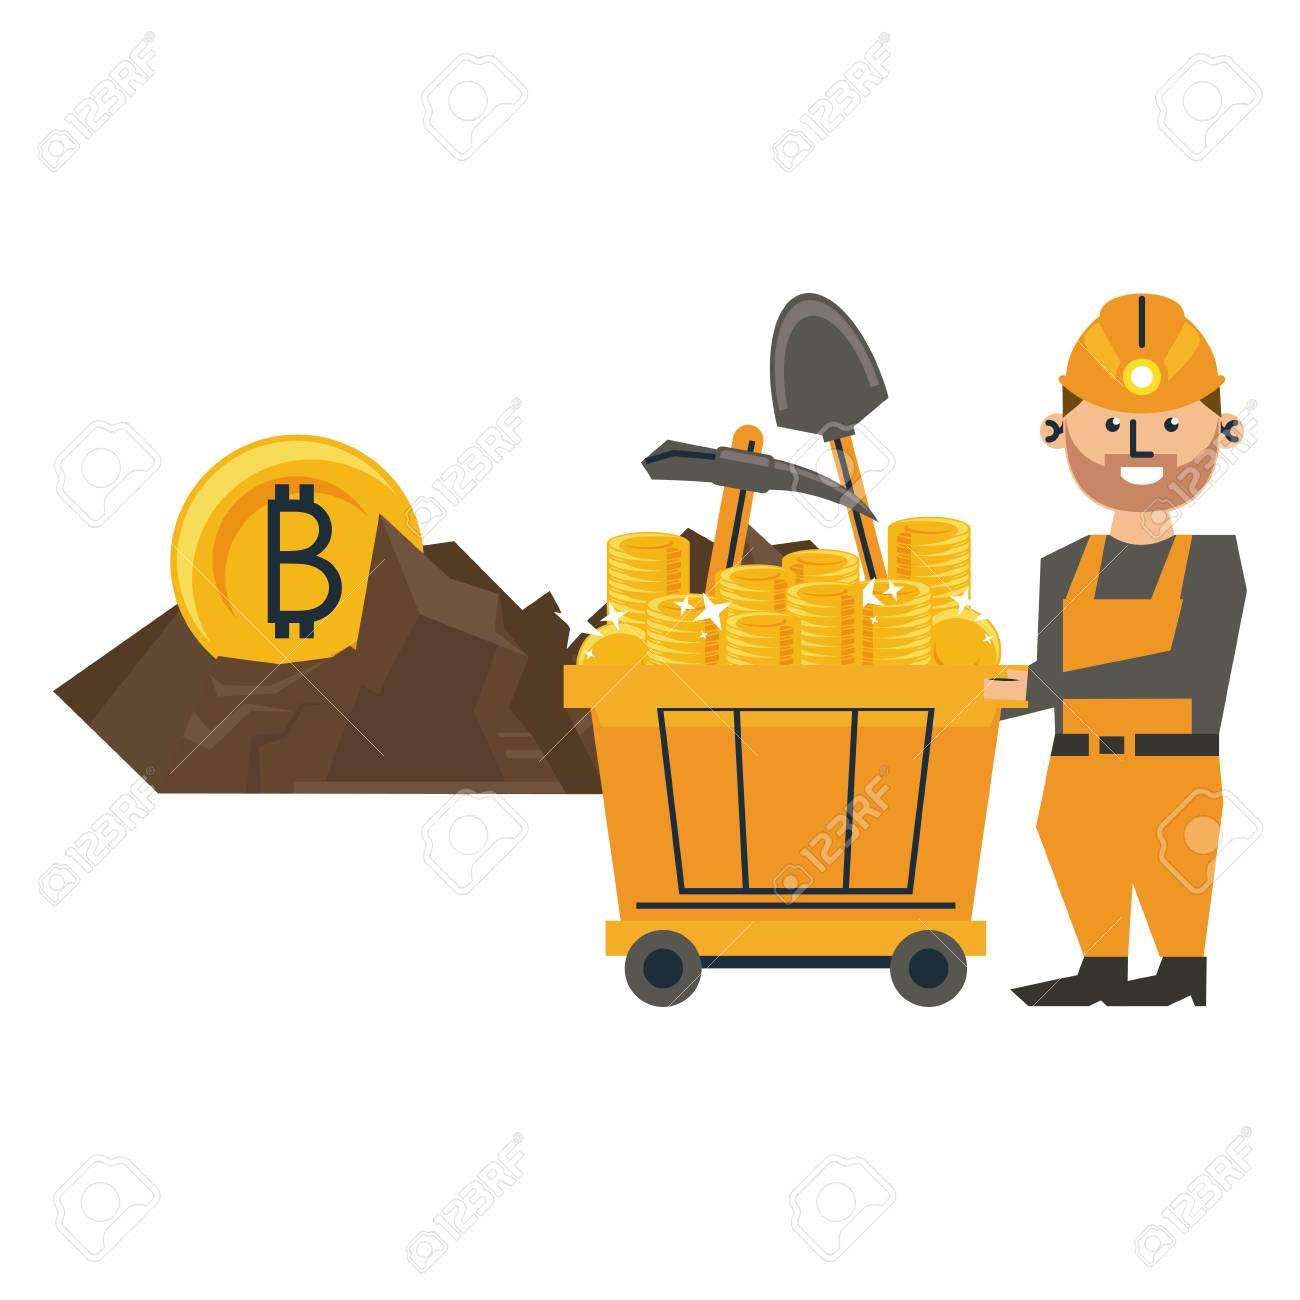 Belt wagon mining bitcoins more than 21 million bitcoins price